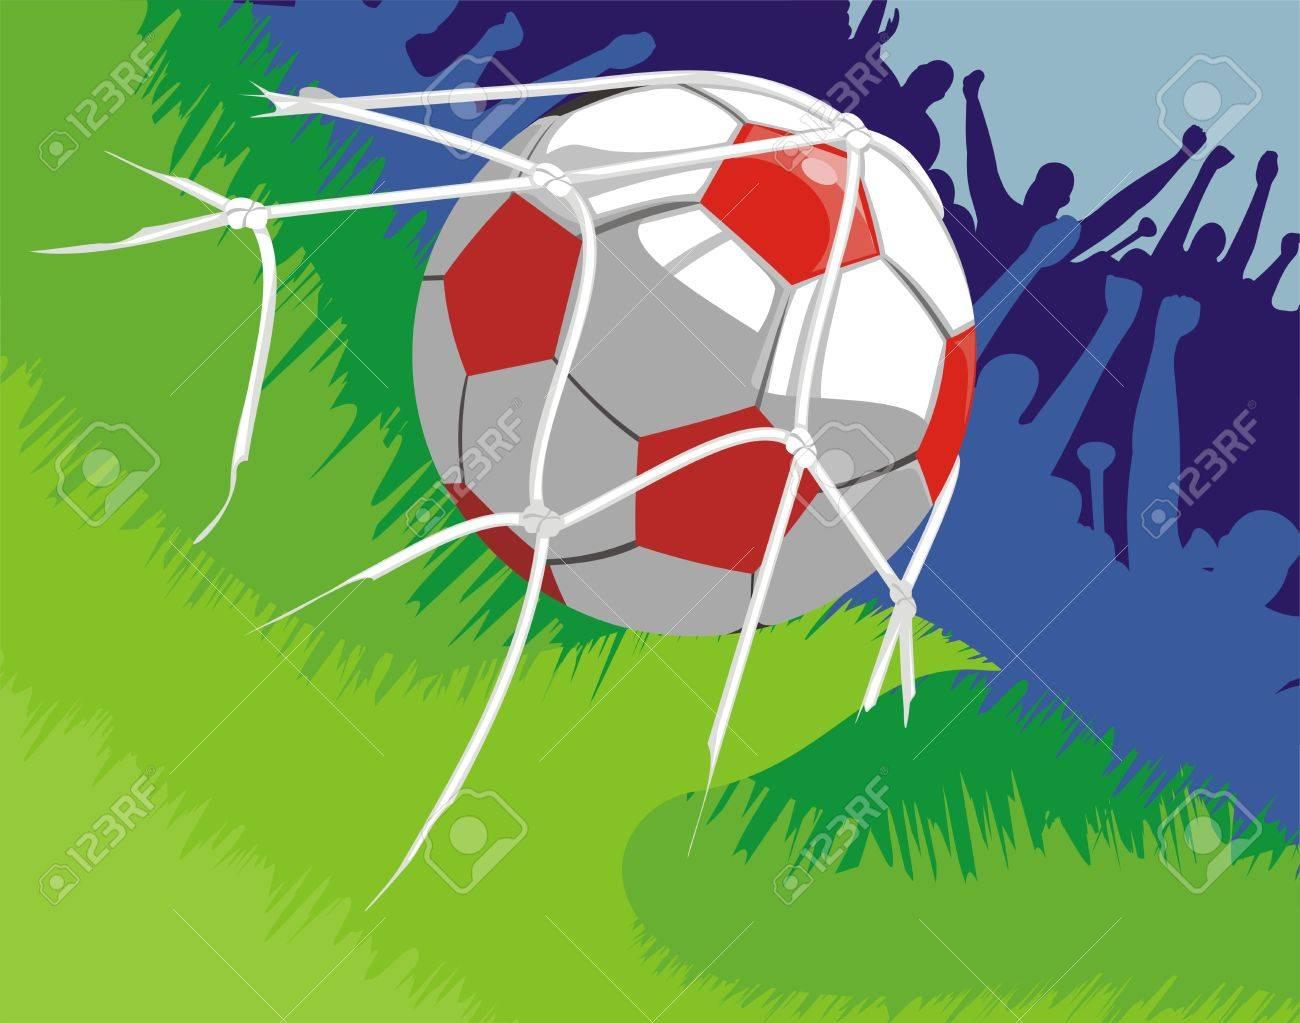 soccer - joy after goal scored Stock Vector - 11944062